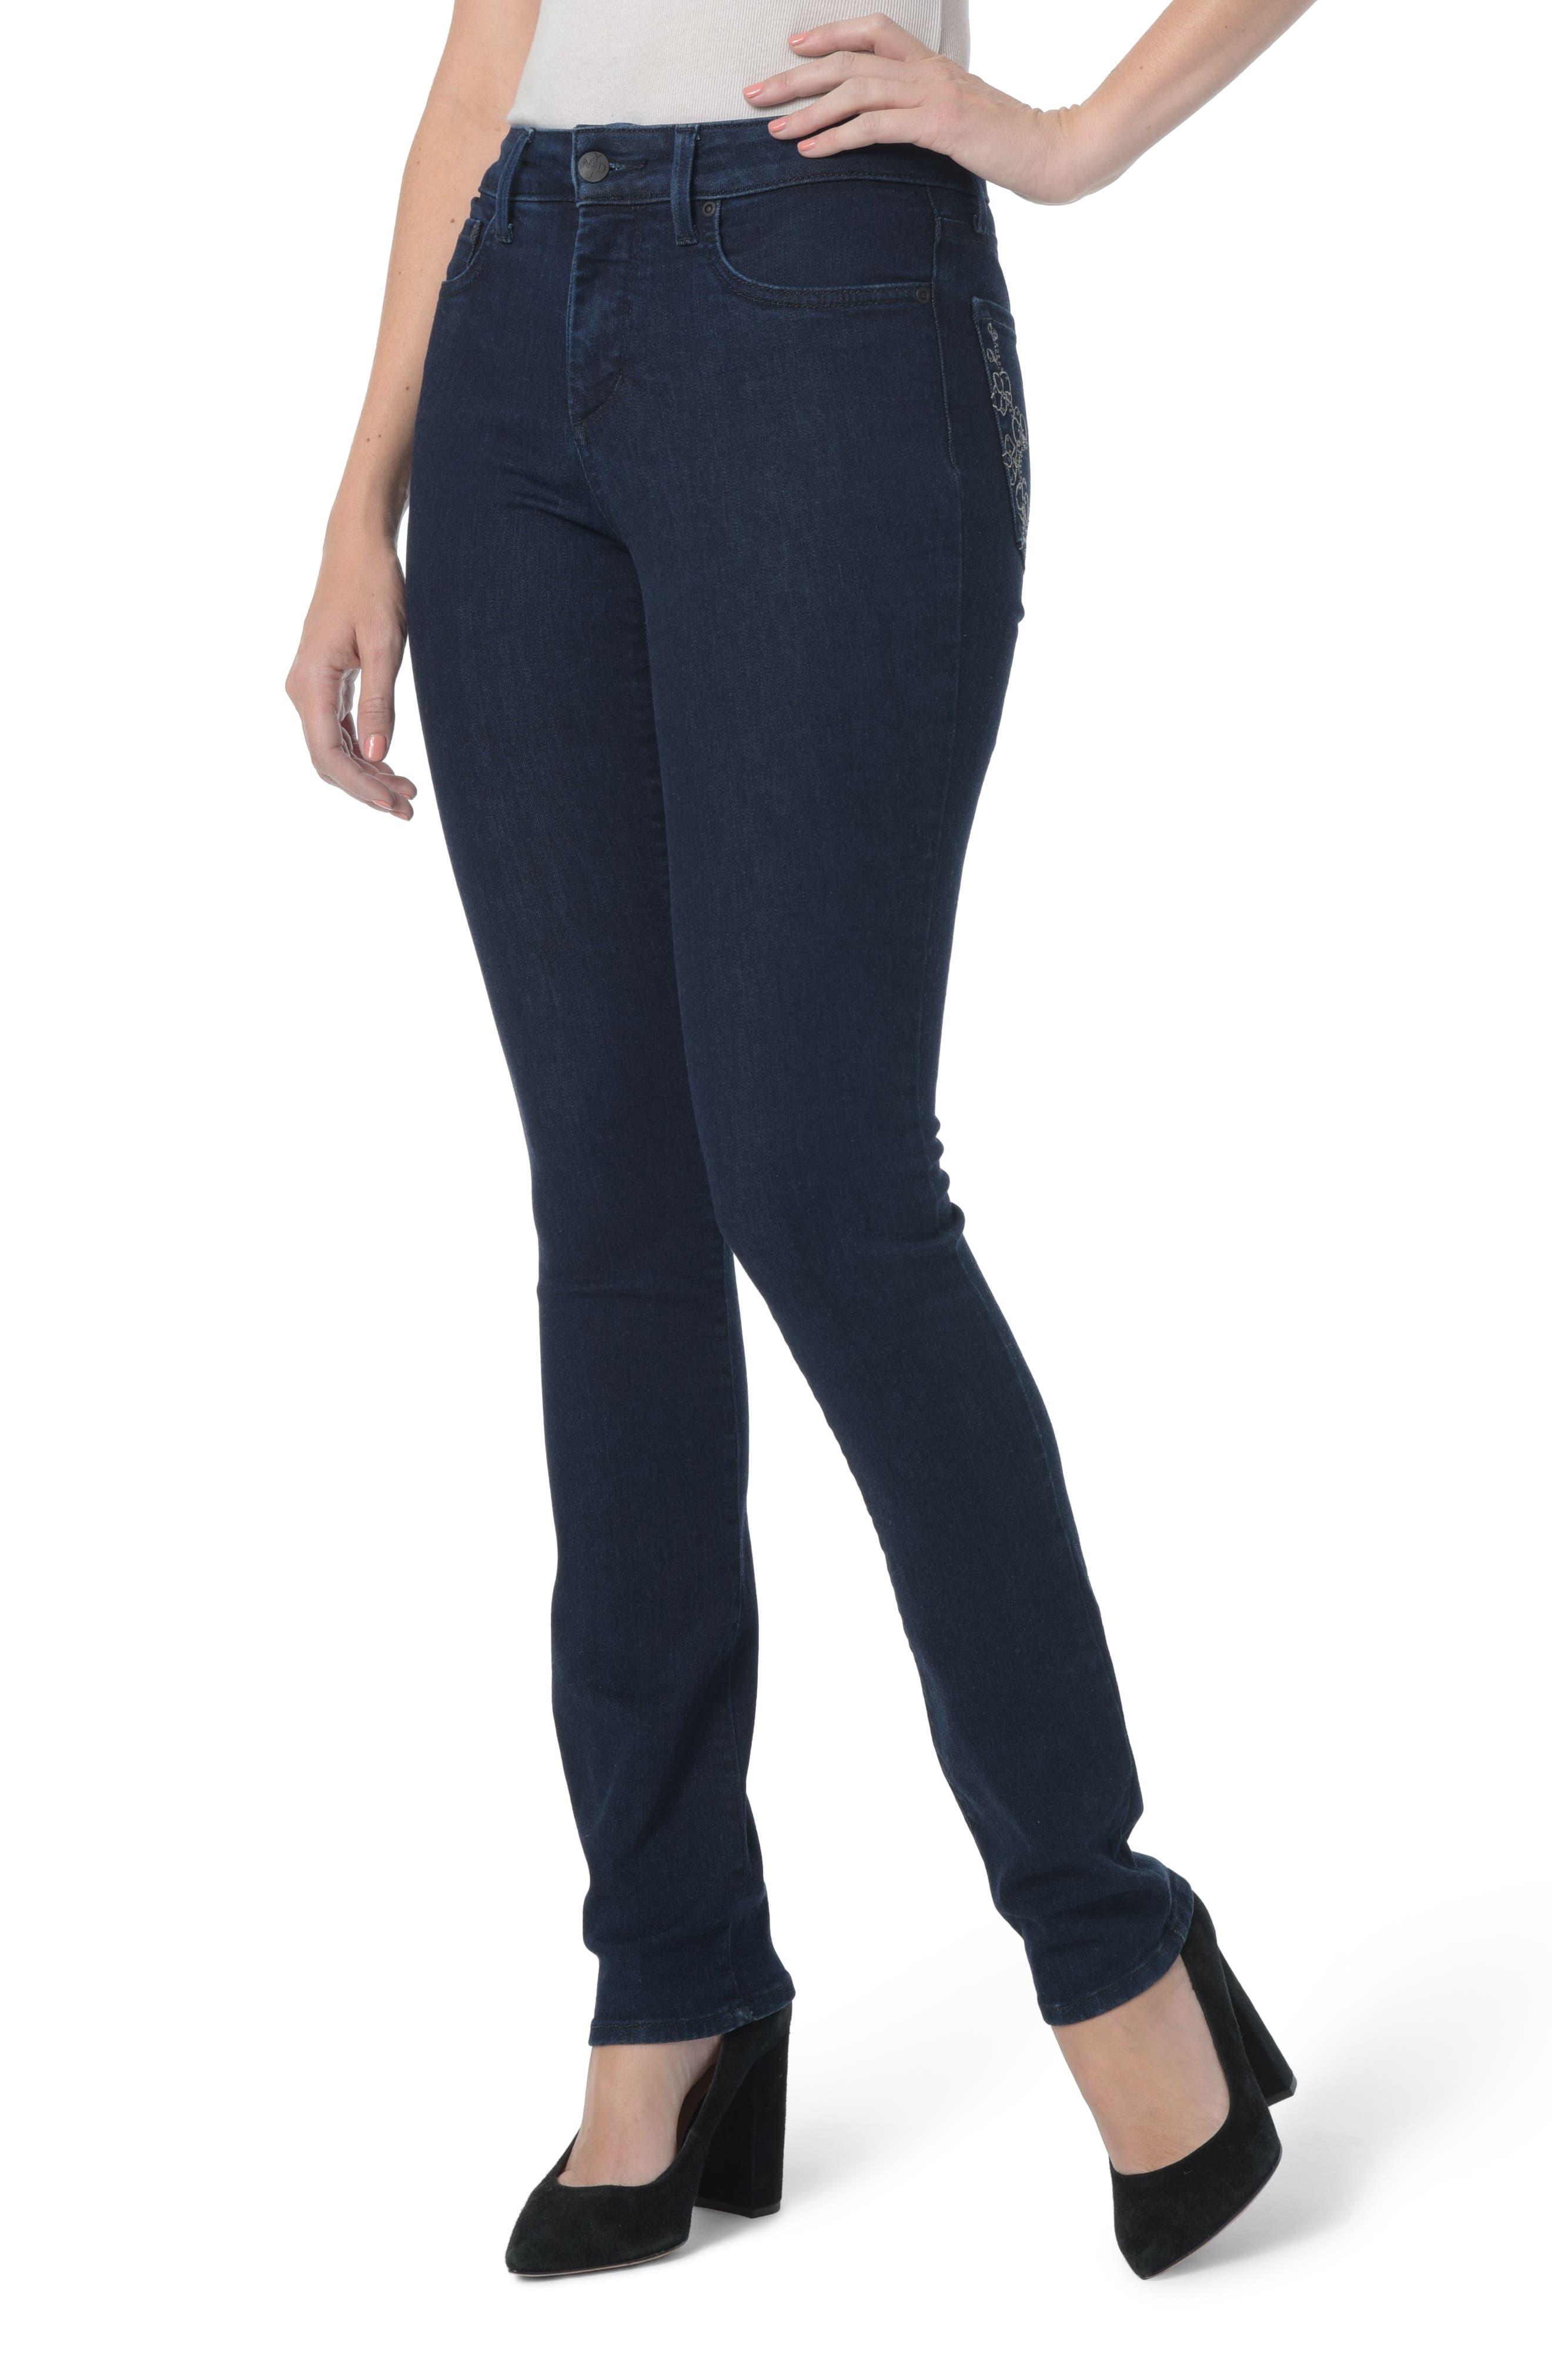 Sheri Floral Bling Stretch Slim Jeans,                             Main thumbnail 1, color,                             408